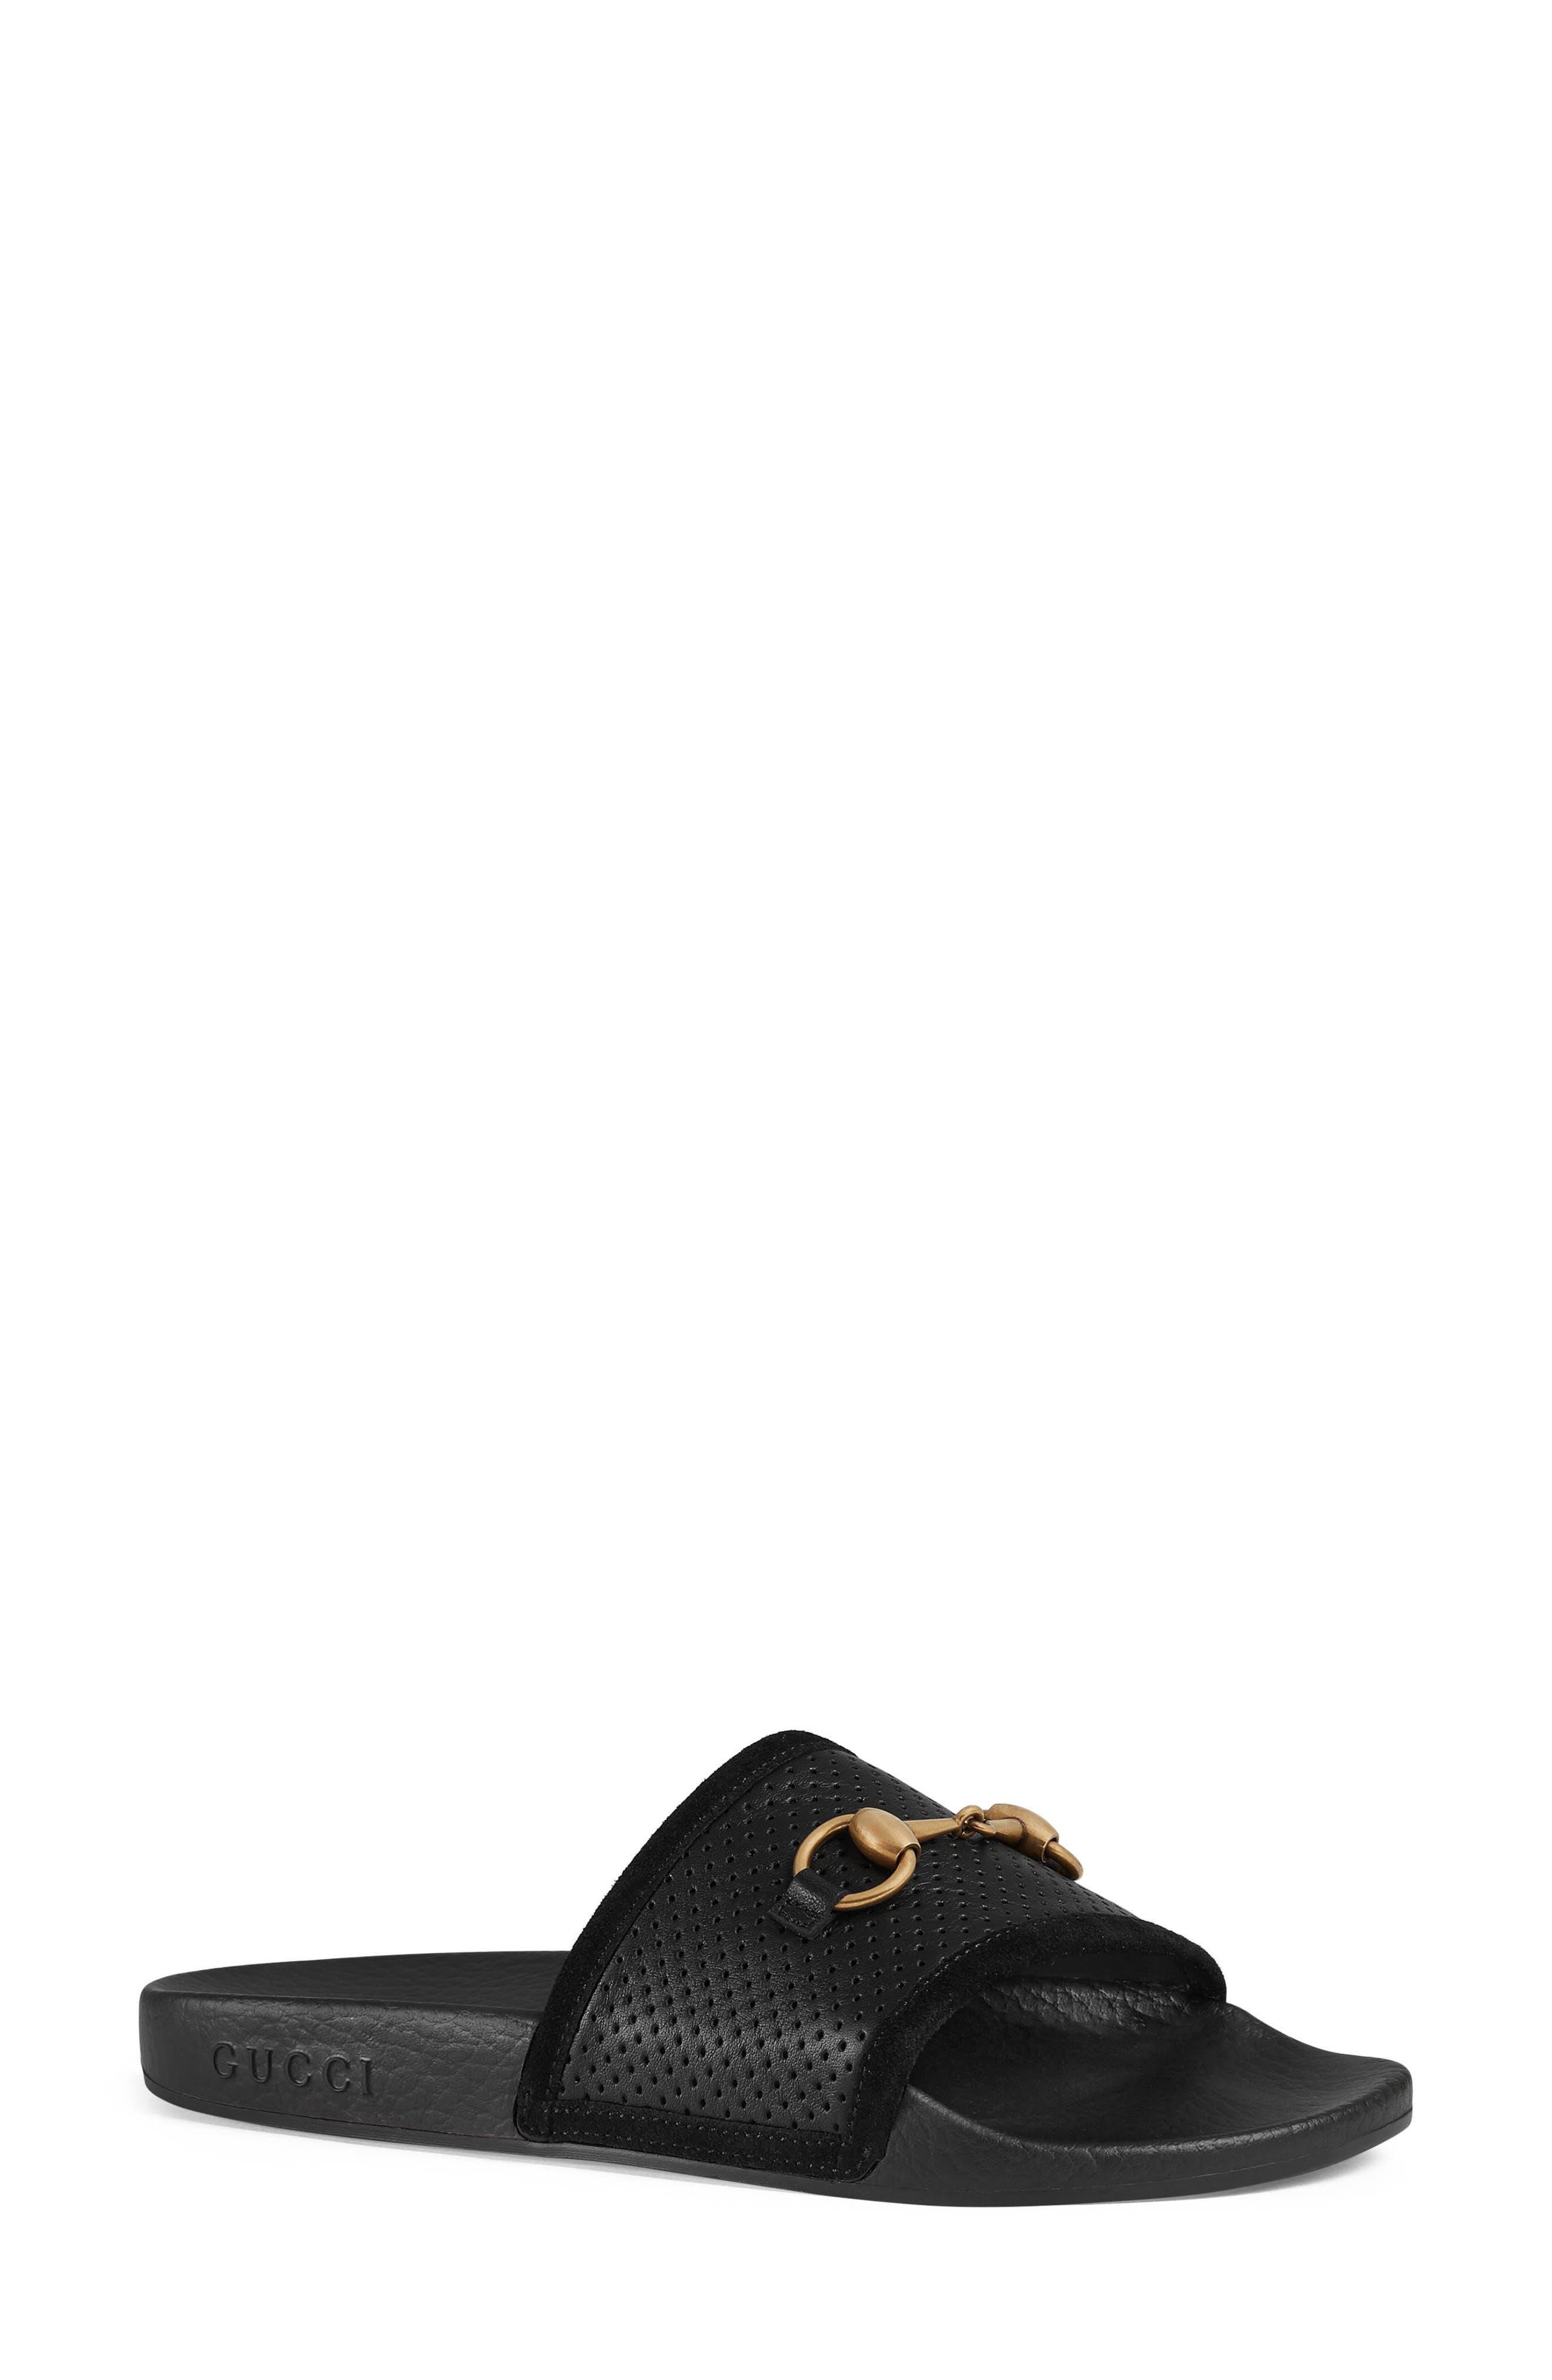 Gucci Women's Pursuit Horsebit Slide Sandal hYWldNg2X5